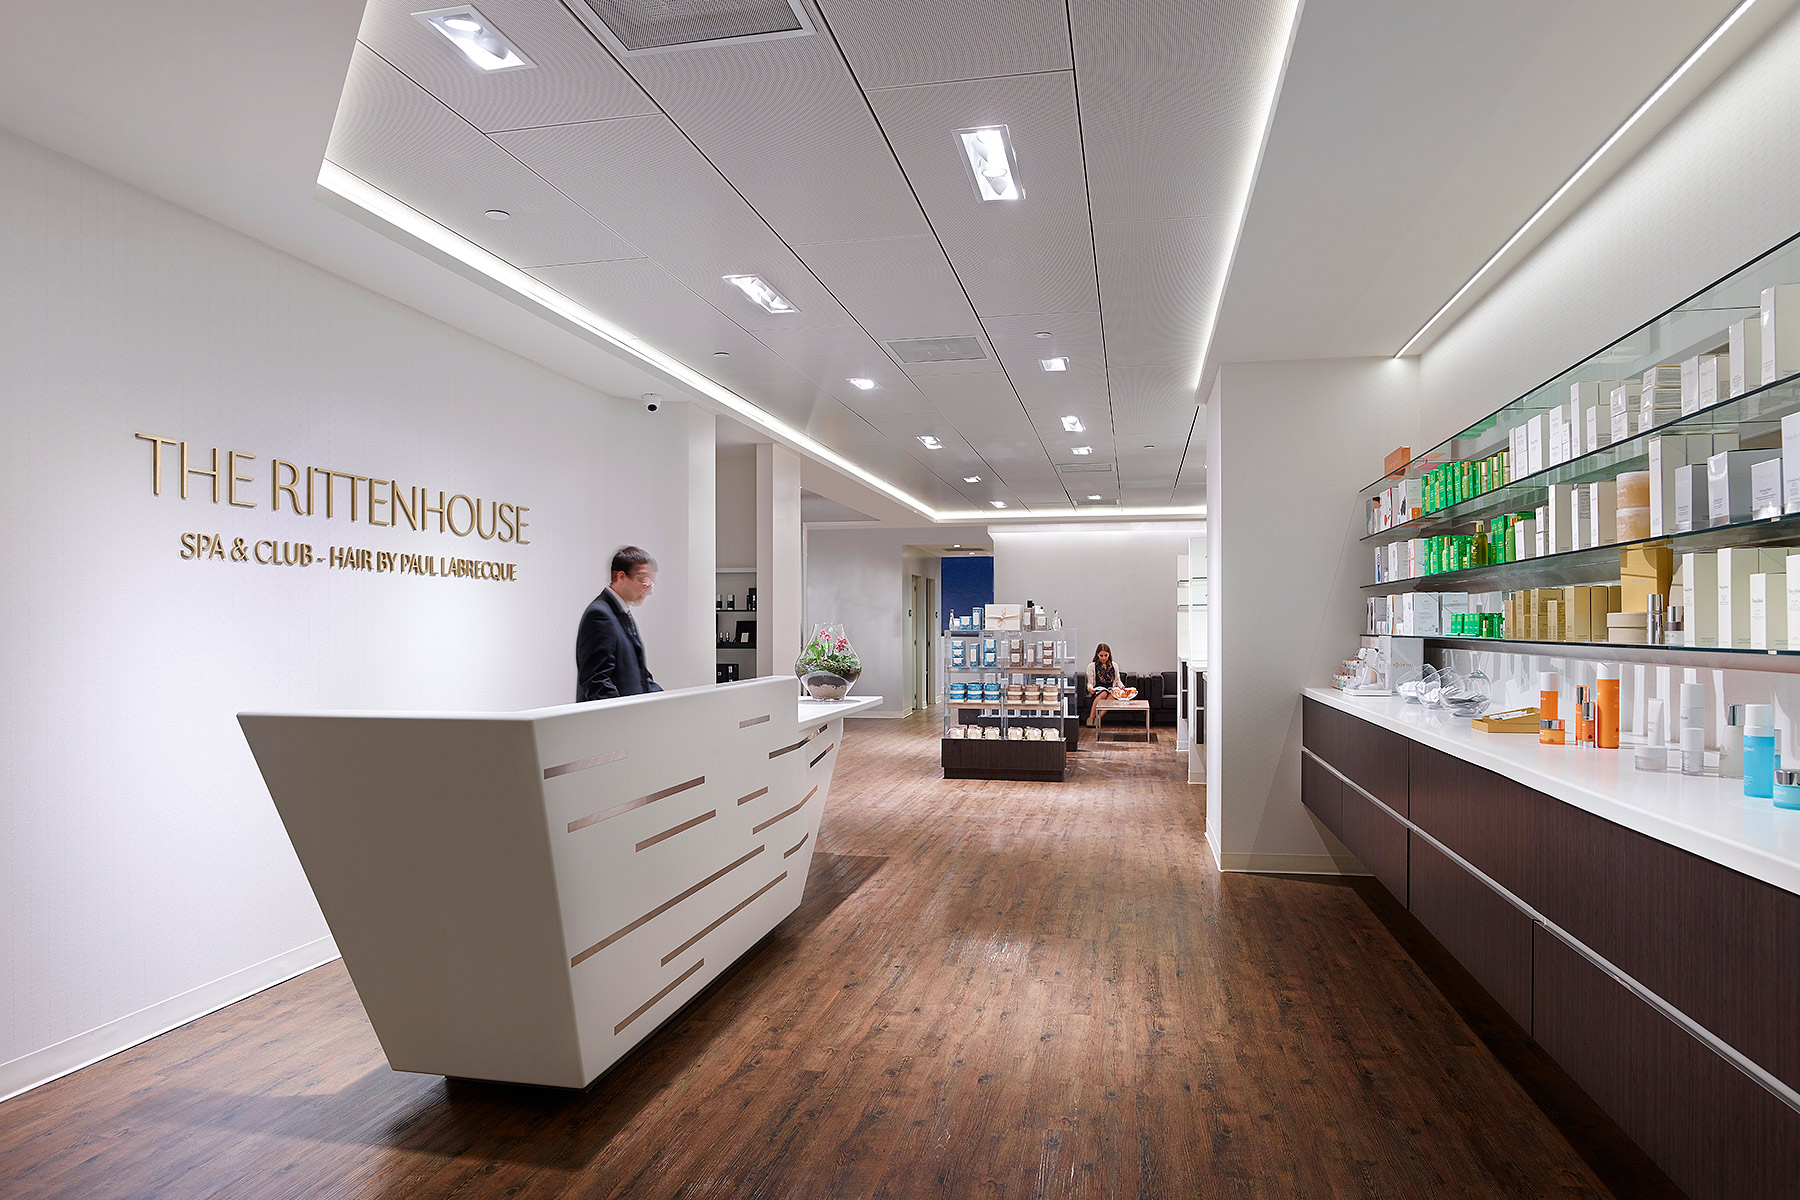 Rittenhouse Hotel BLT Architects Philadelphia, PA